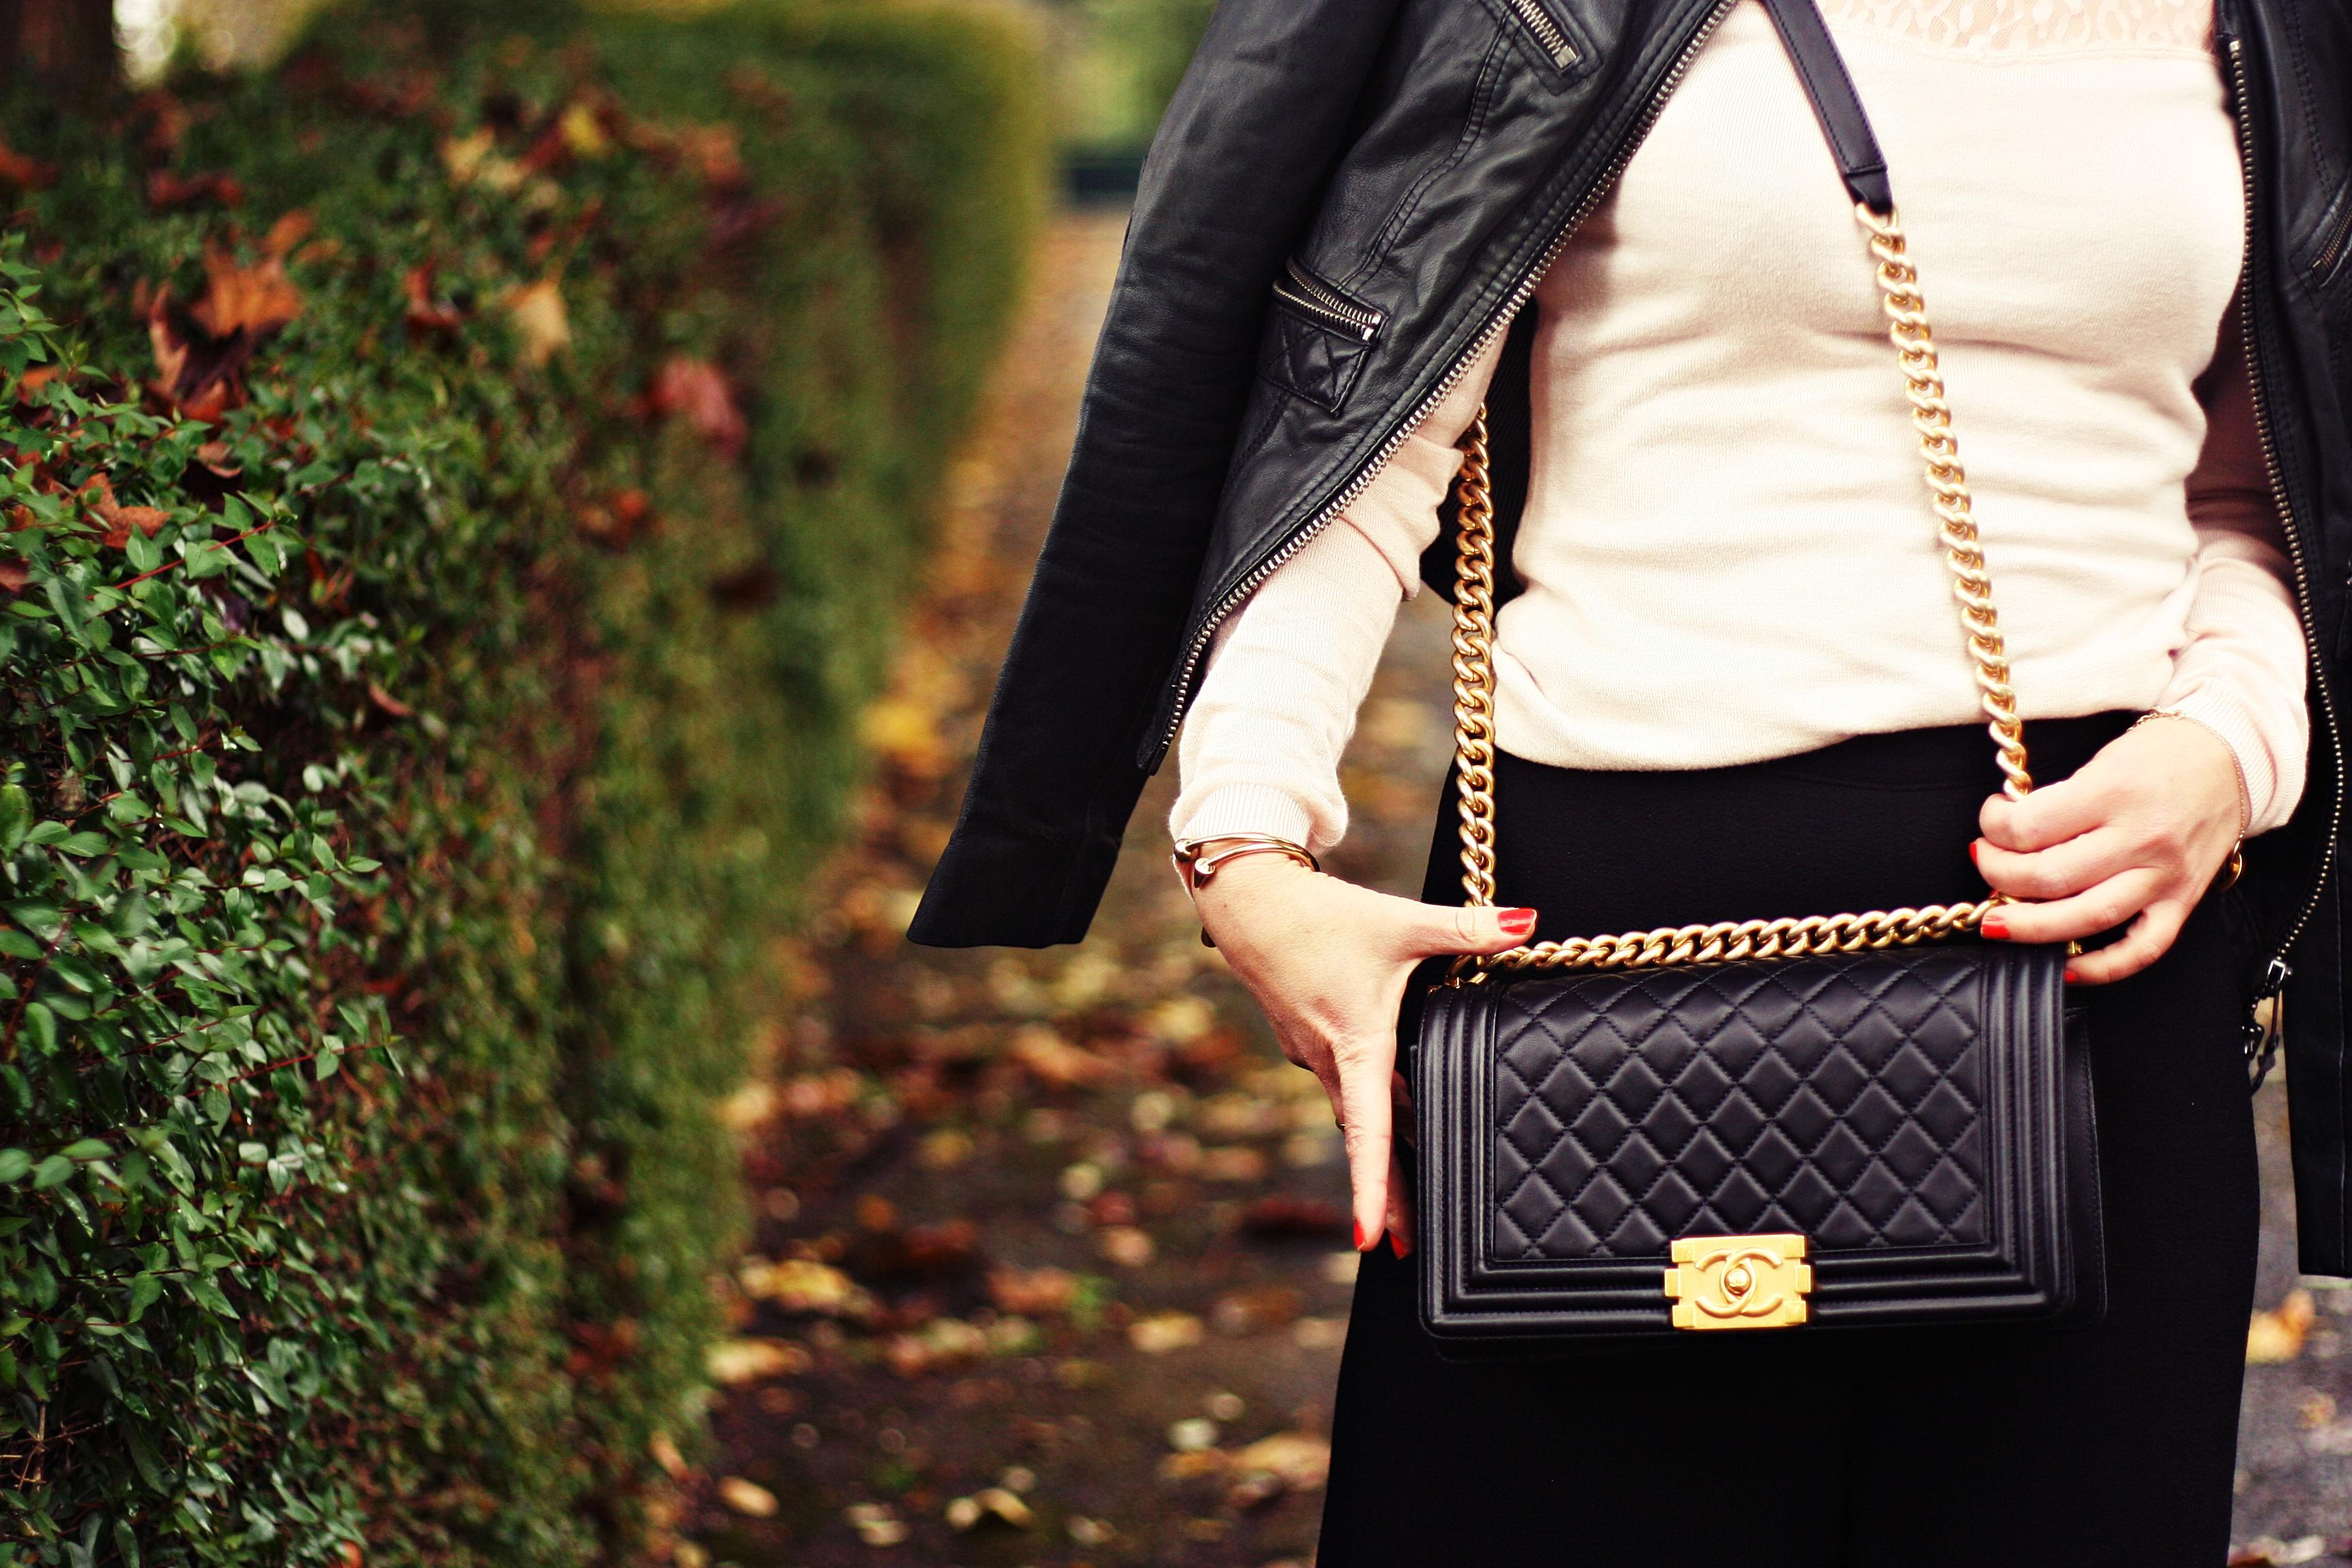 blog-mode-minnetonka-mocassins-sac-boy-chanel-look-pantalon-taille-haute-version-large-rose-poudre